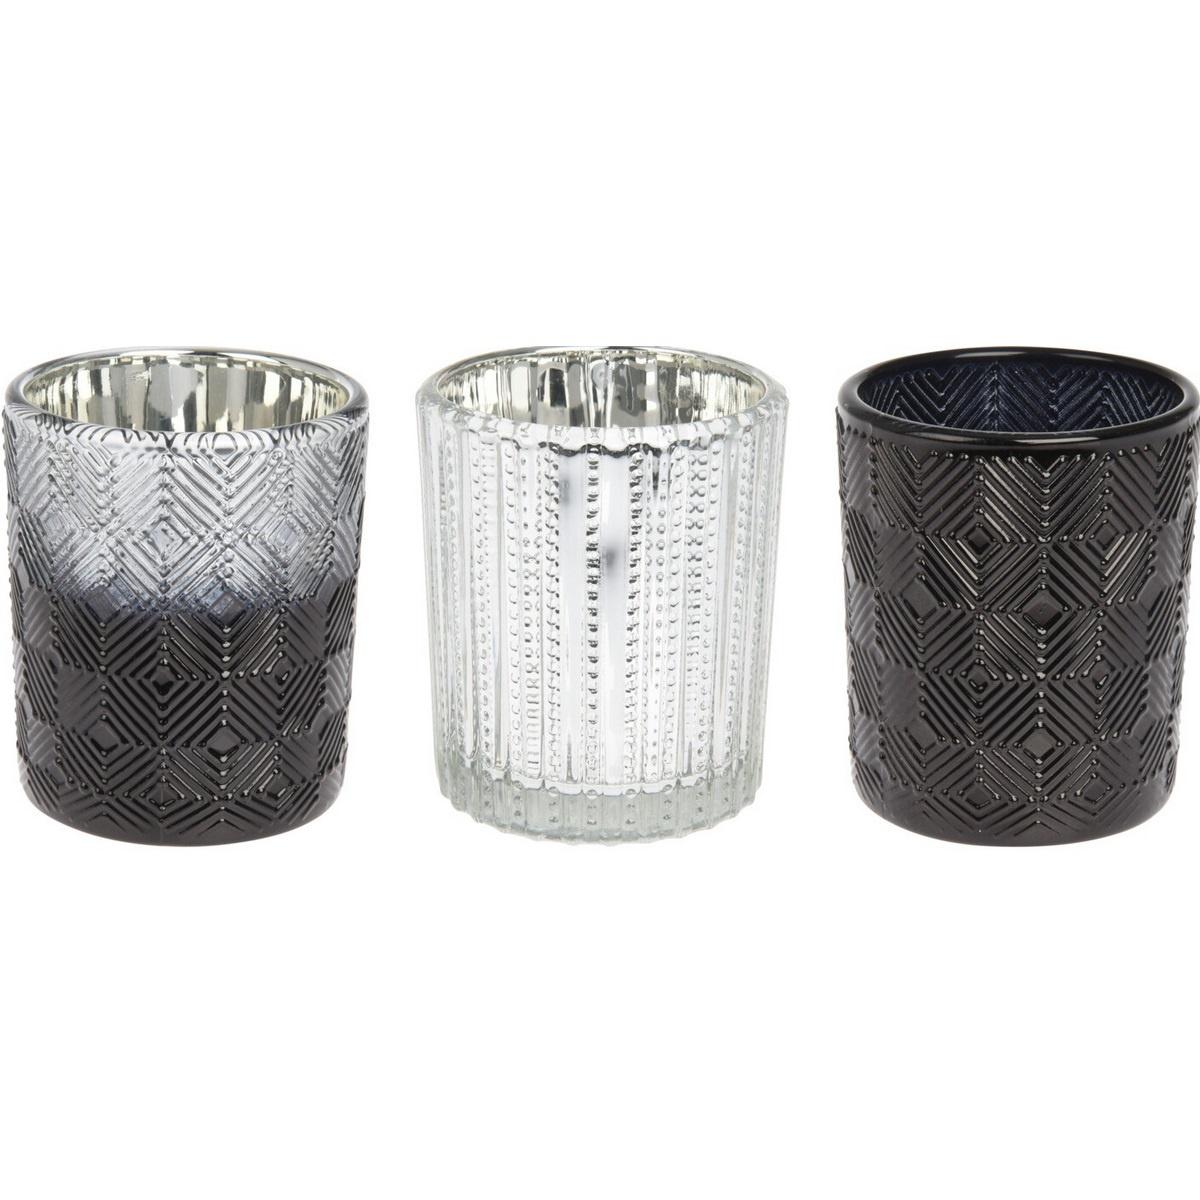 Sada svícnů na čajové svíčky Modern geometric 3 ks, 17 x 5,8 x 8,3 cm